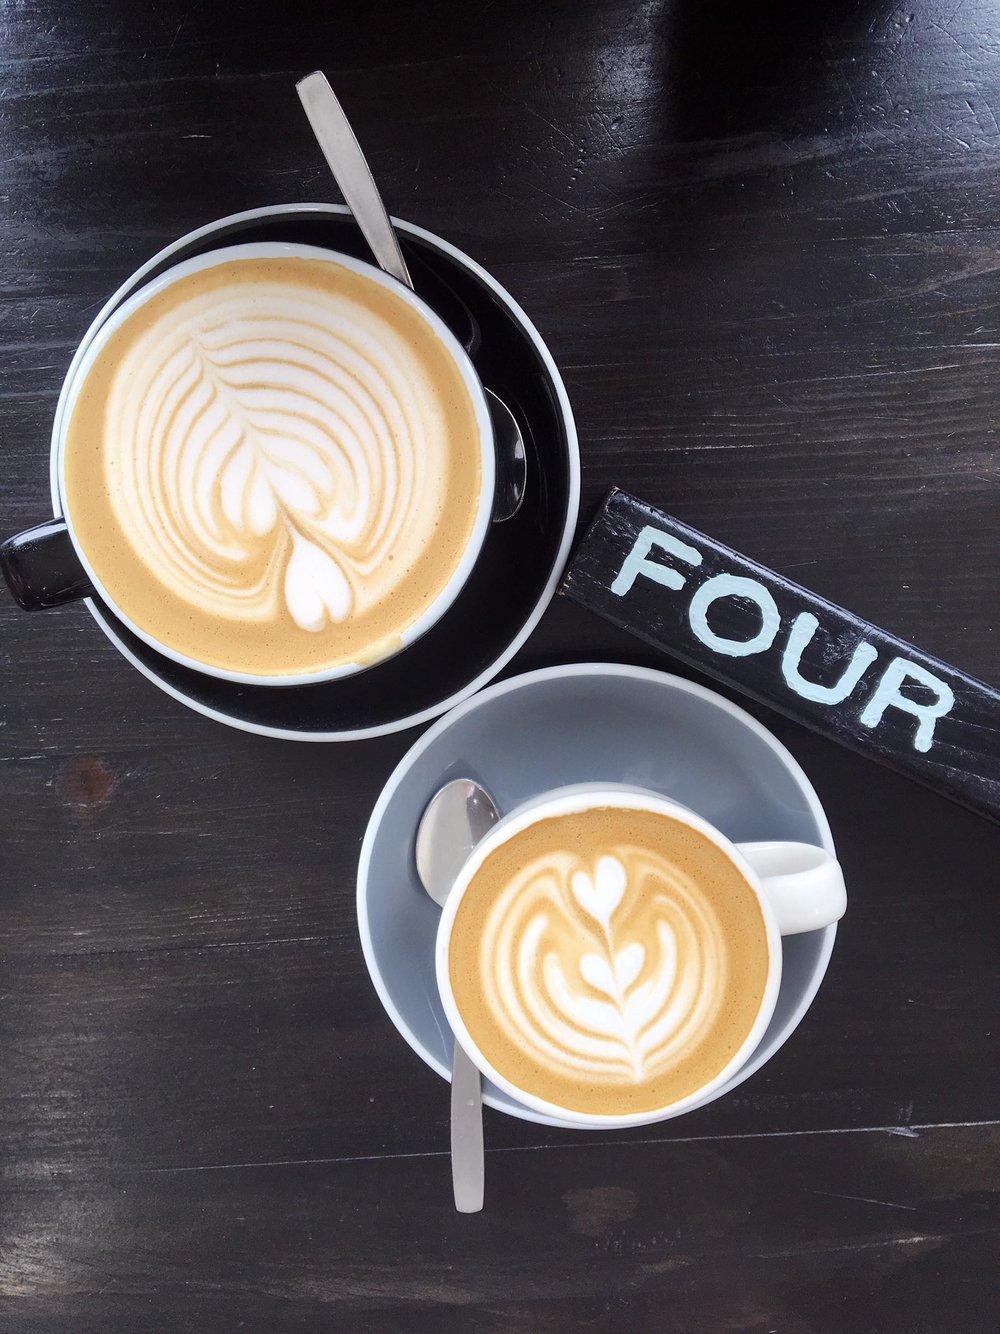 Brunch at Baddies | Almond Milk Latte | Travel and Lifestyle Blogger | Toronto Ontario